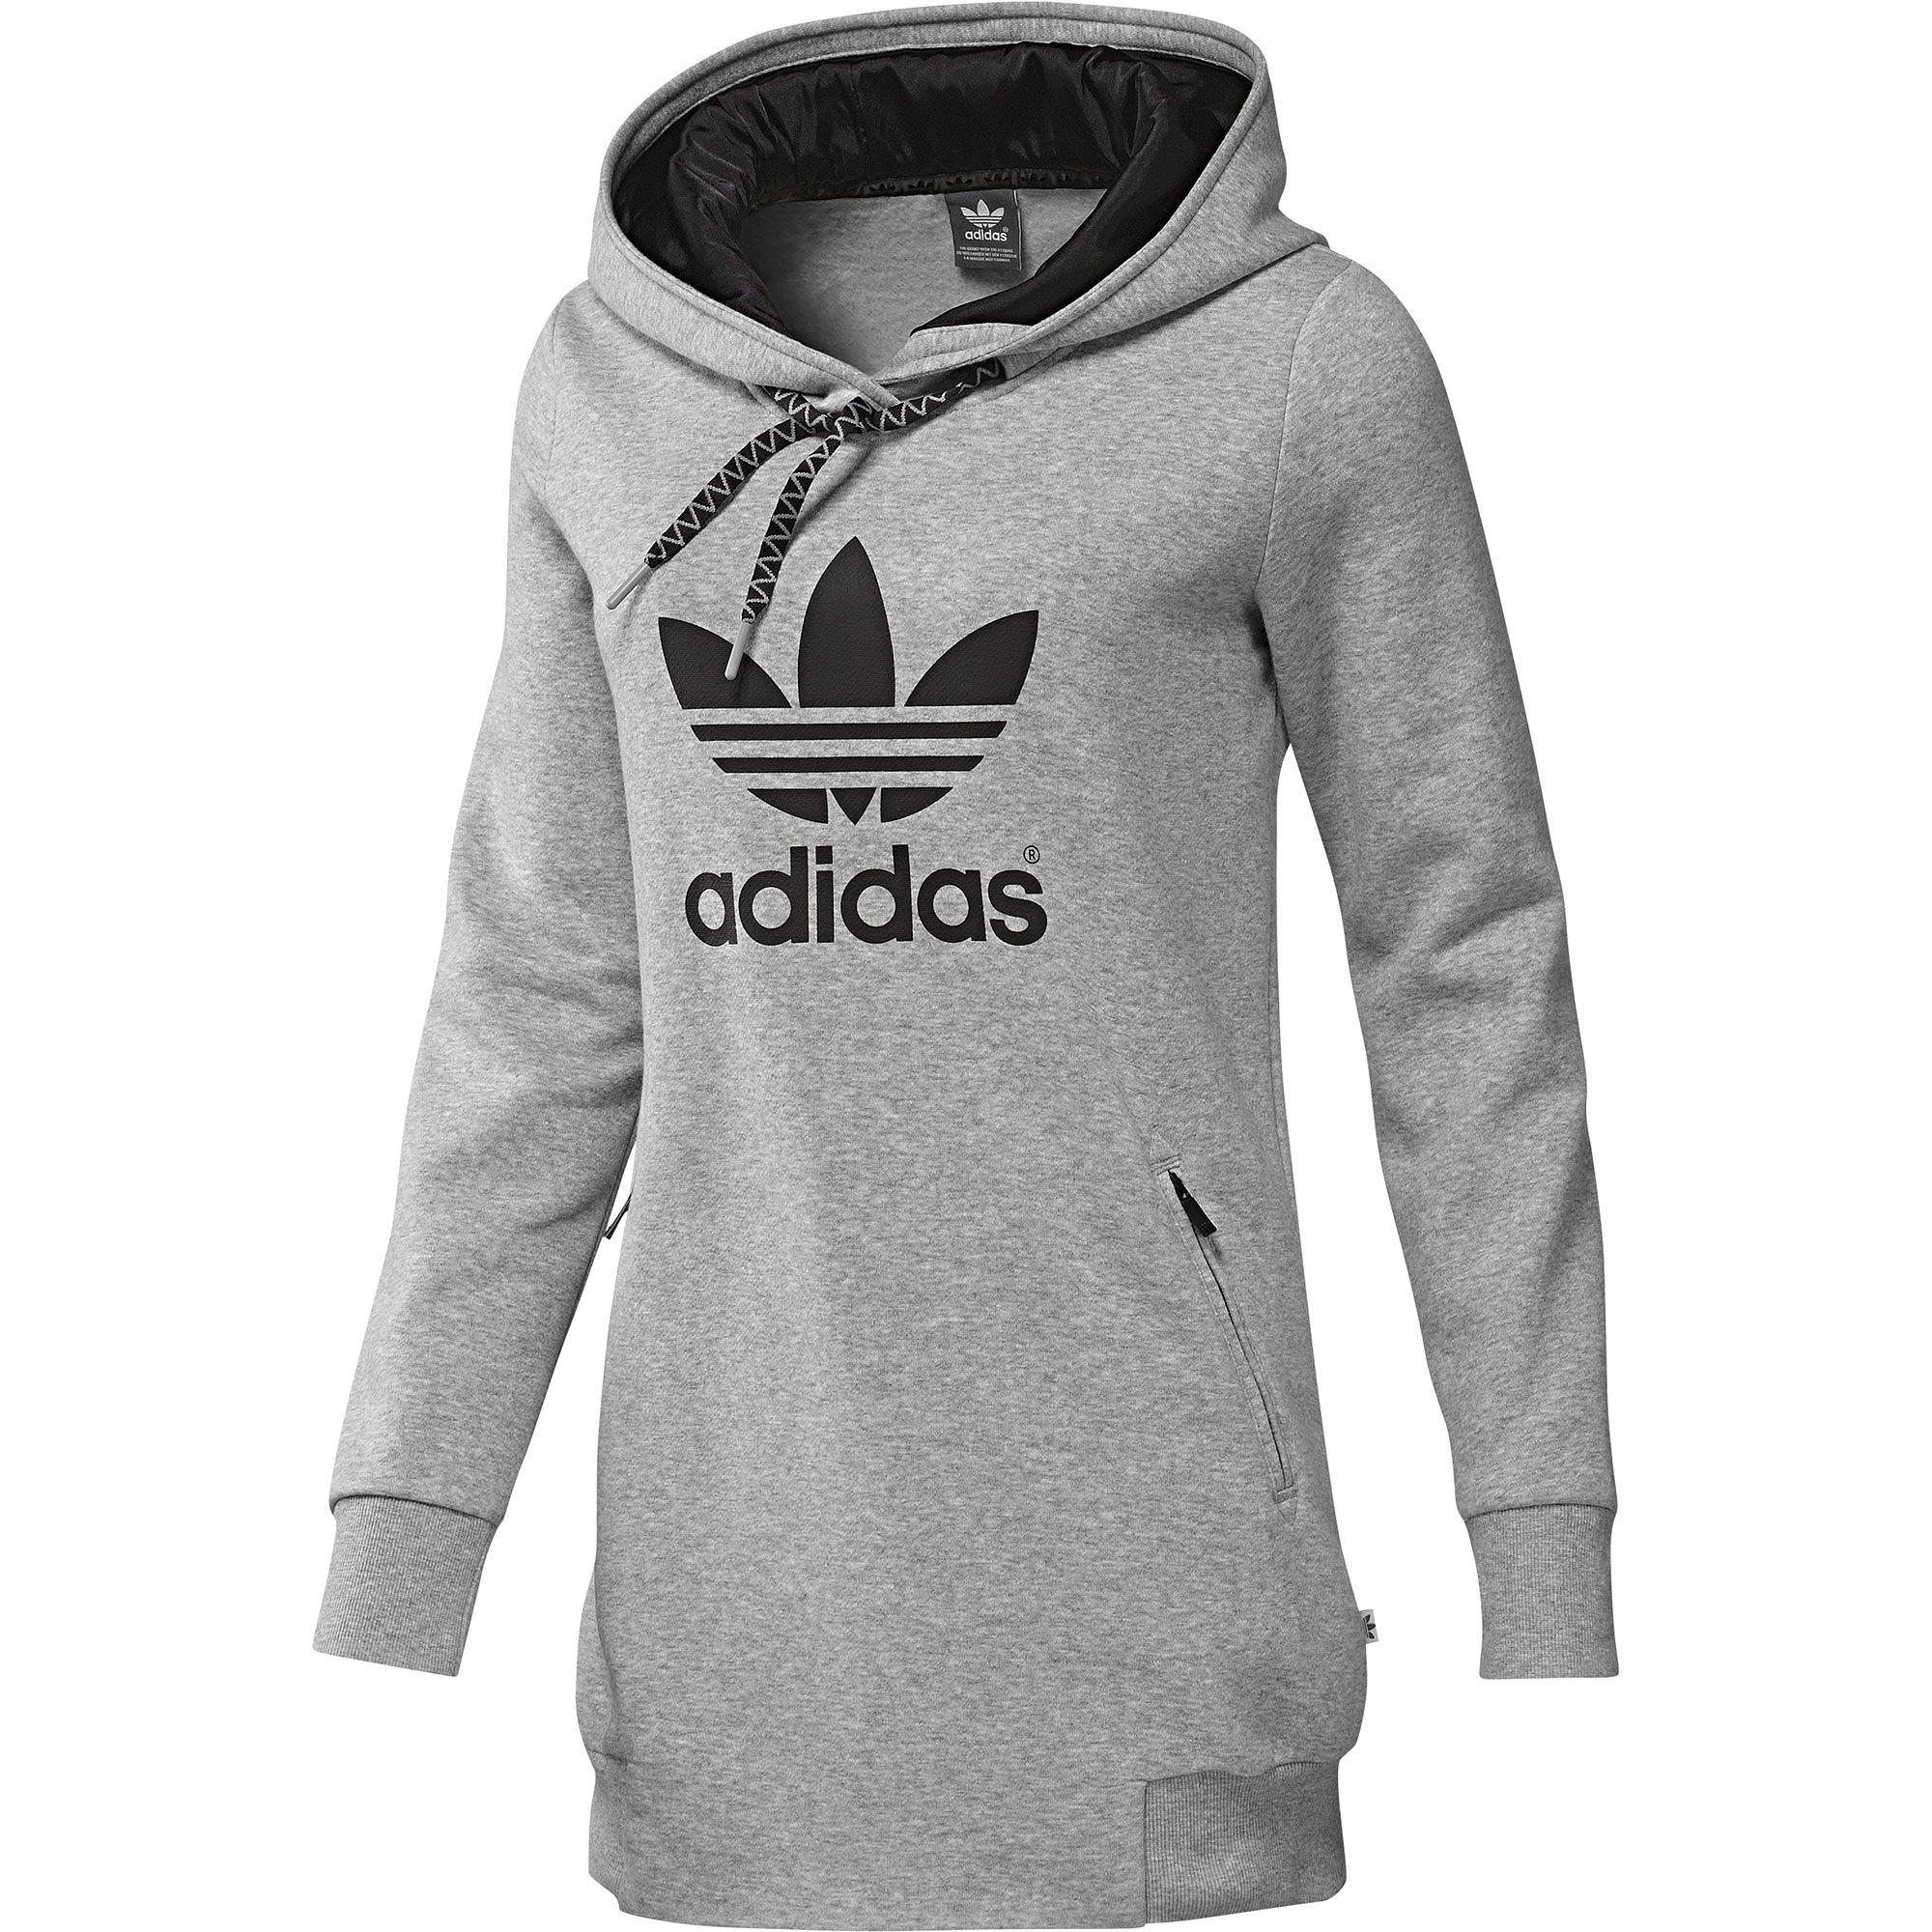 Adidas Women S Long Logo Hoodie Adidas Australia Adidas Women Hoodies Hoodies Womens [ 2000 x 2000 Pixel ]